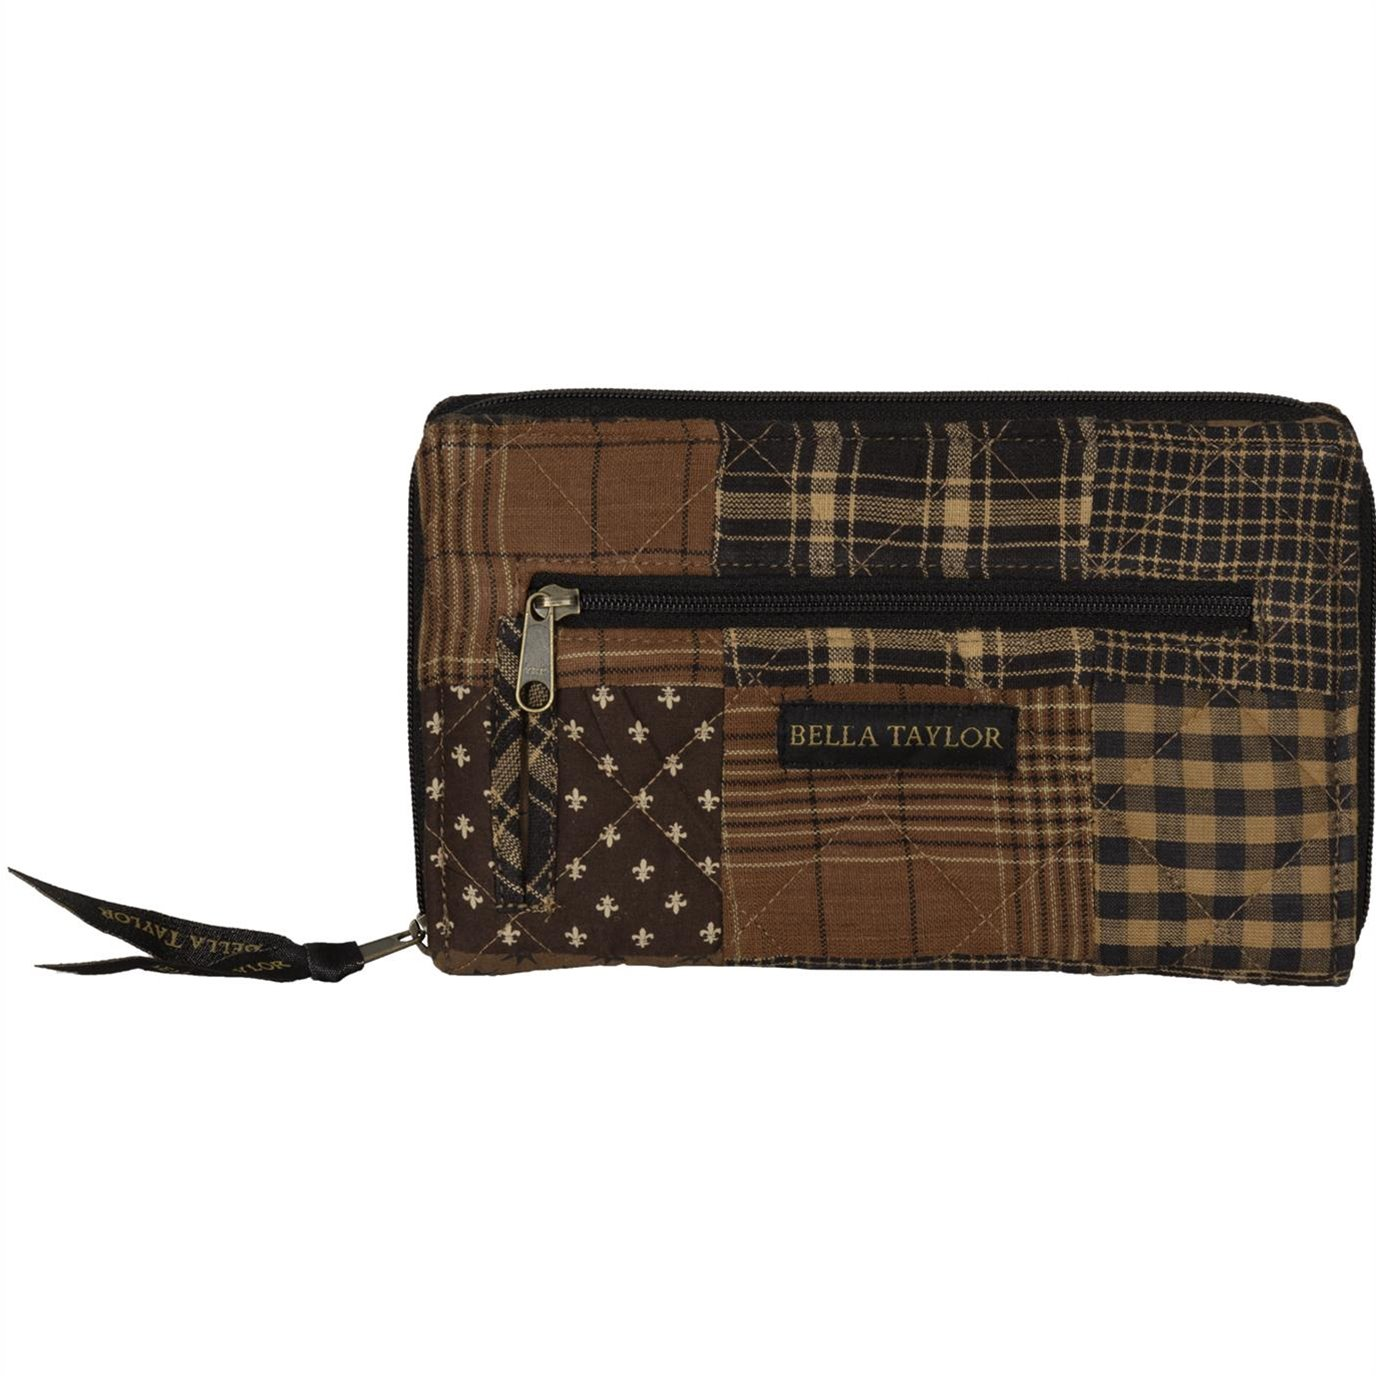 Ironstone Wrist Strap Wallet